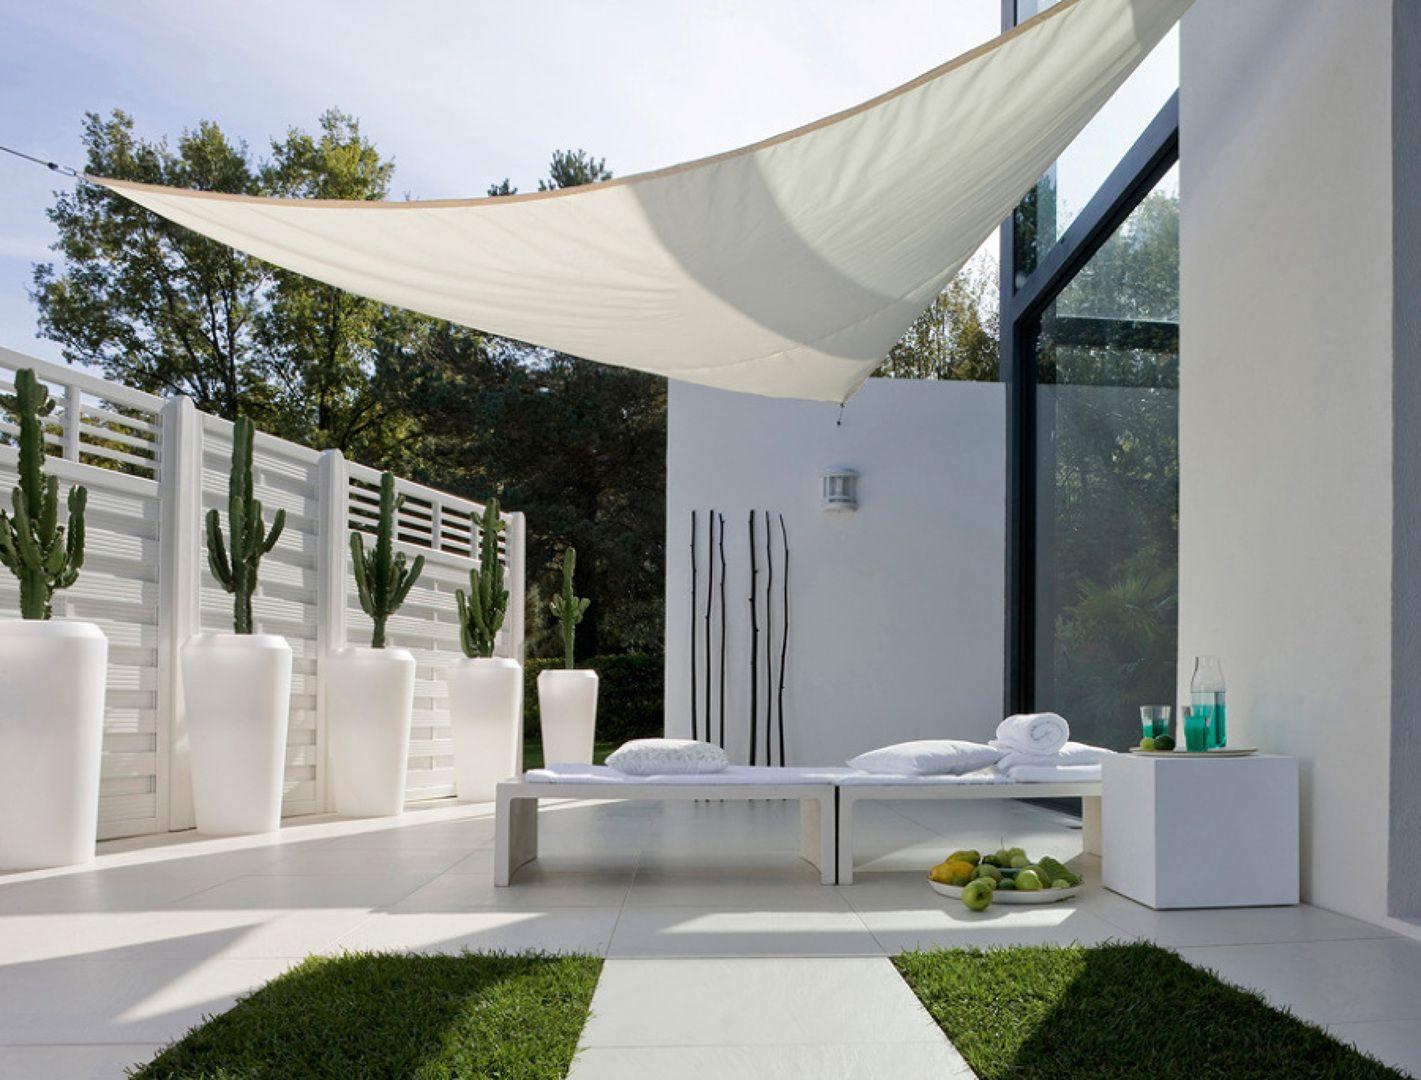 copertura tessuti Arredamento giardino, Patii e Giardini